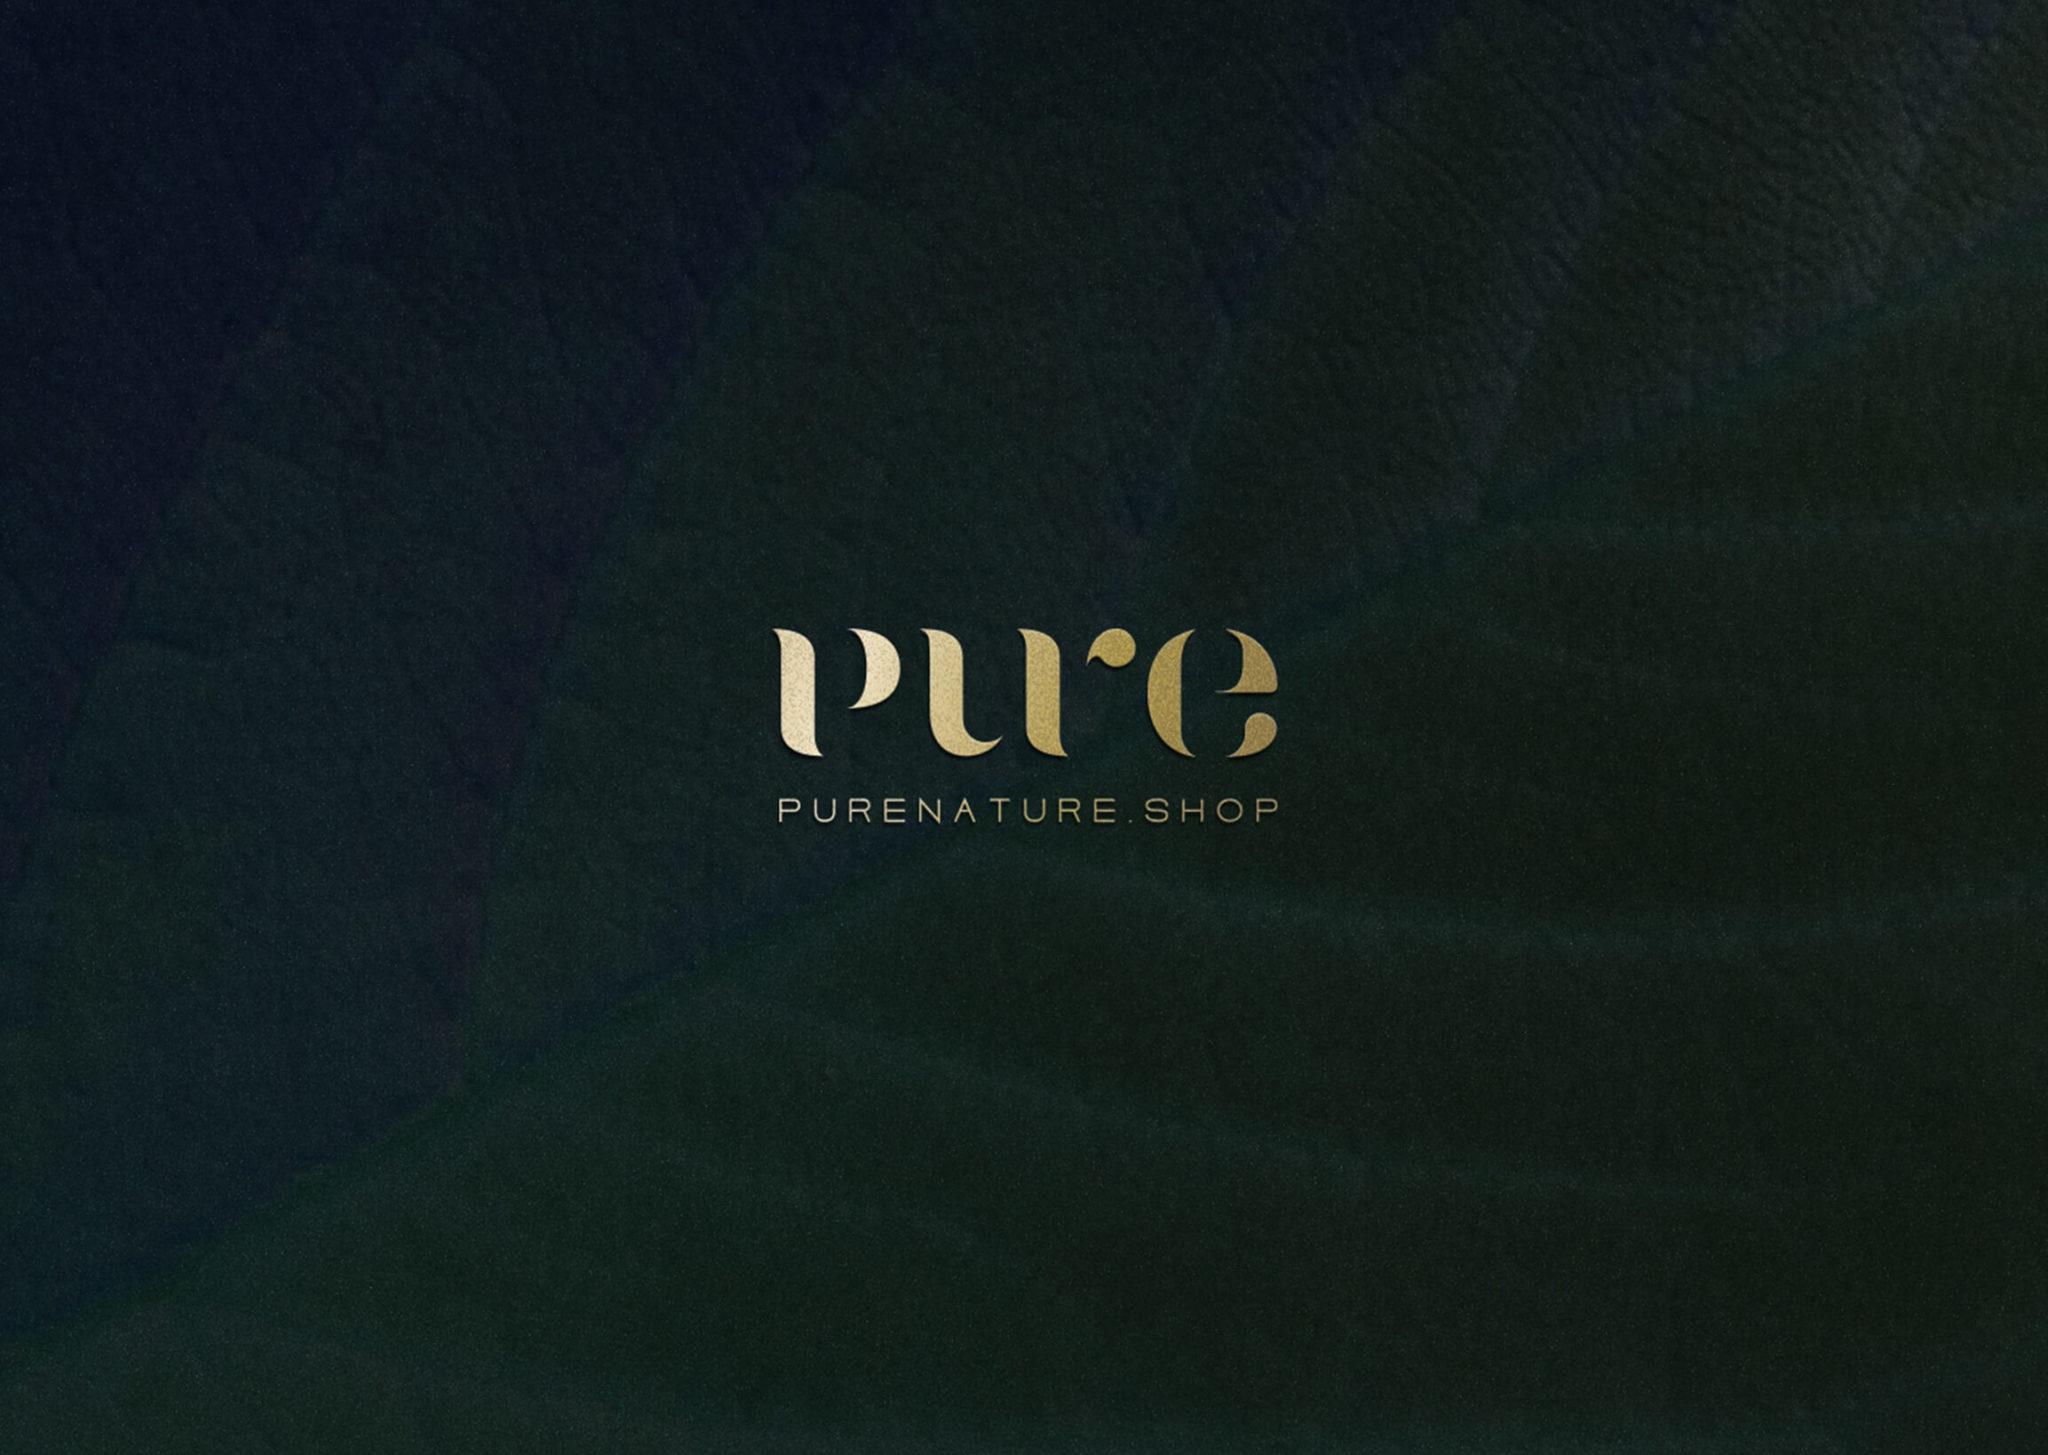 PURE-NATURE_2560Artboard-1